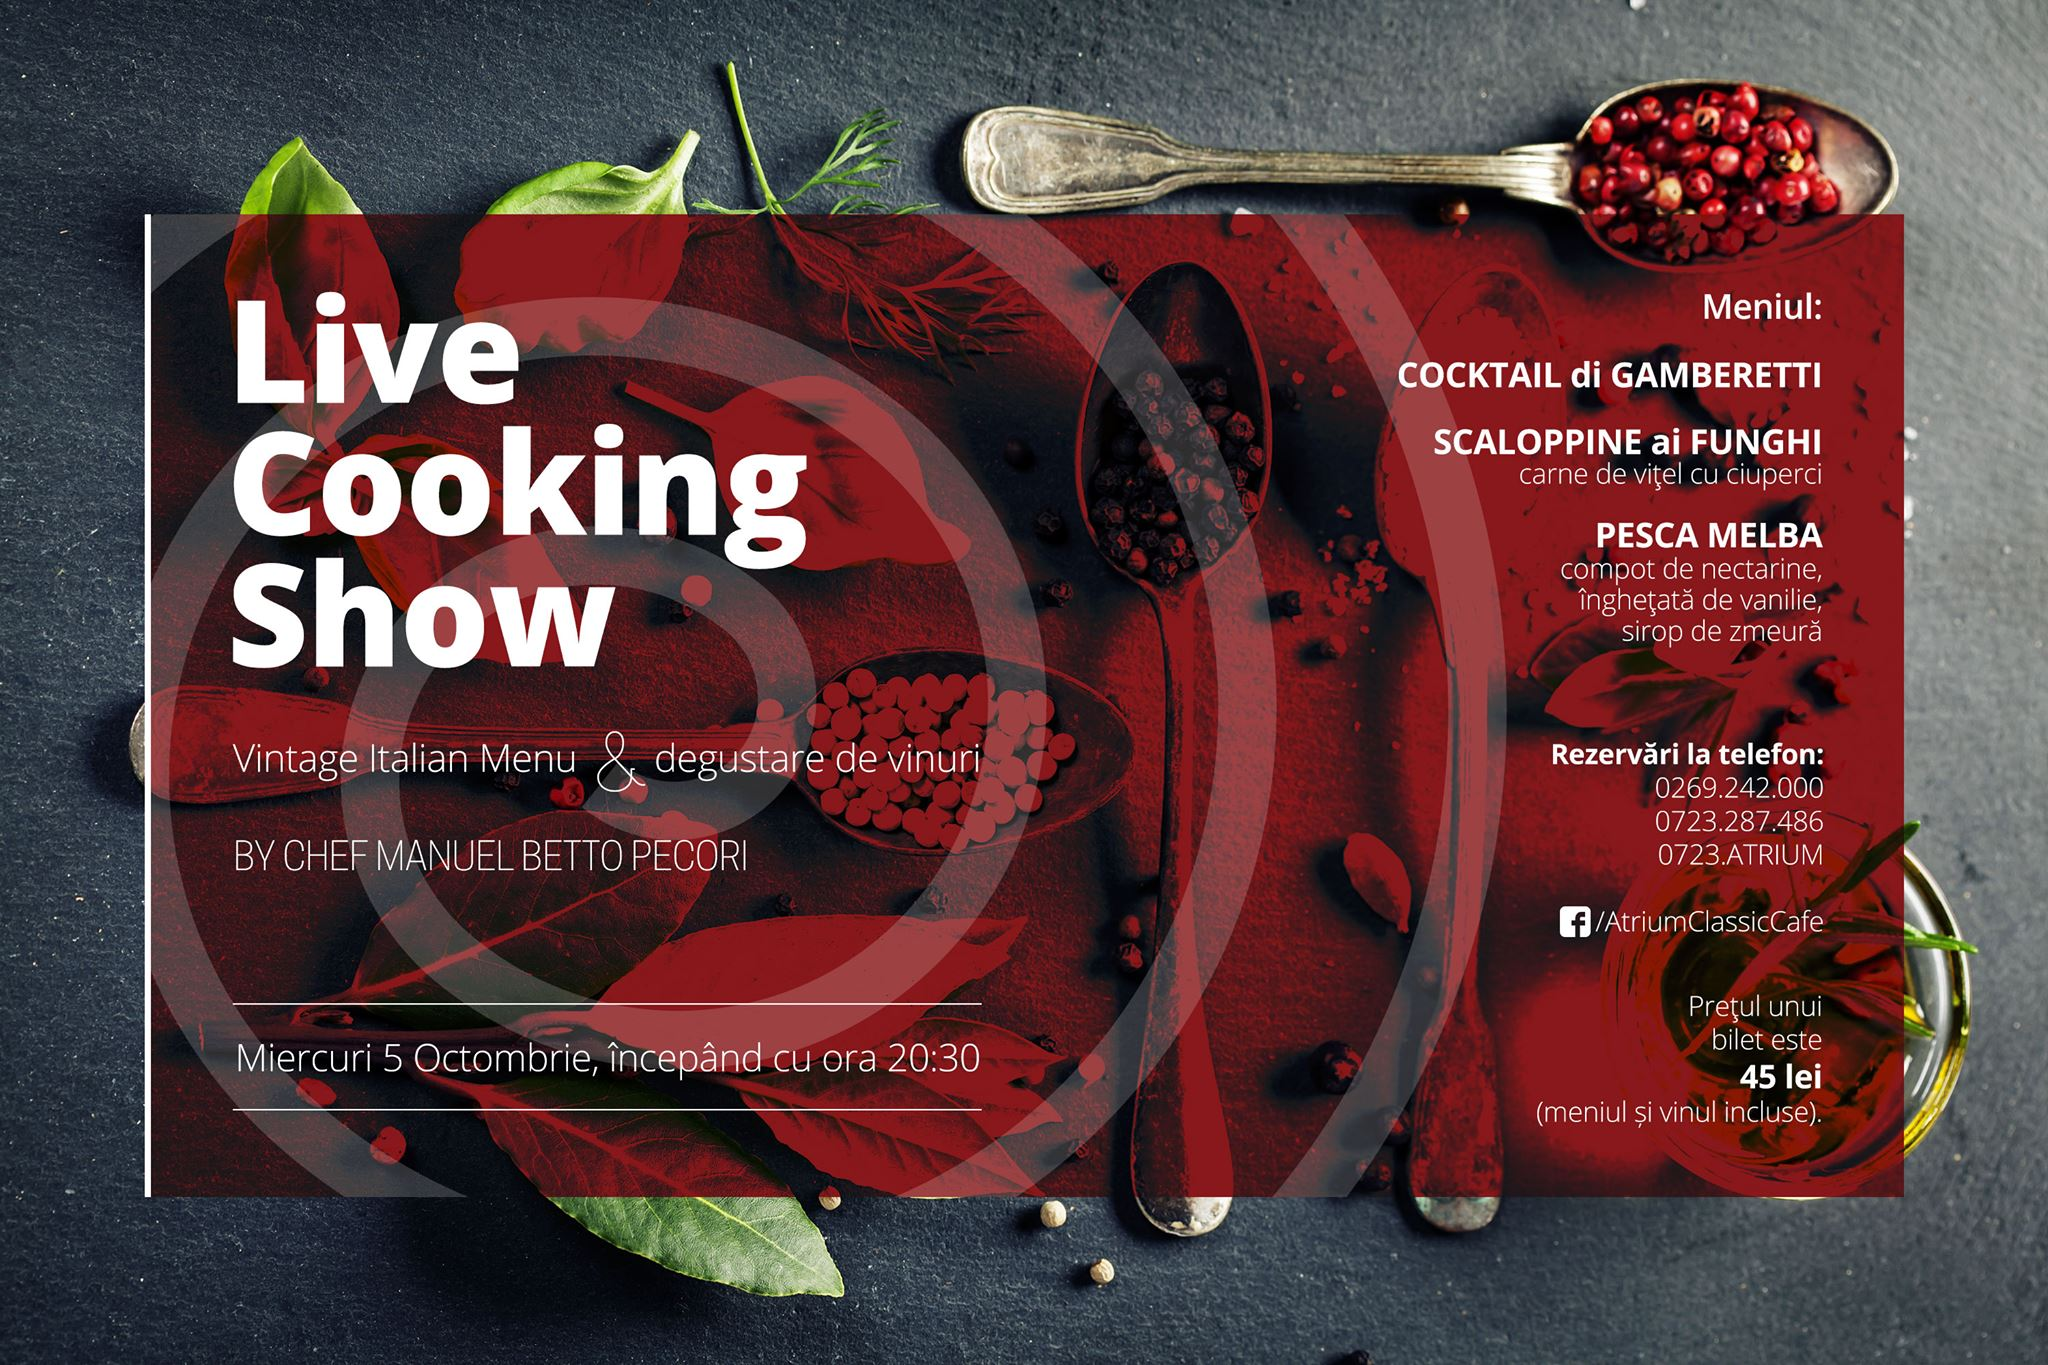 Live Cooking Show - Vintage Italian Menu